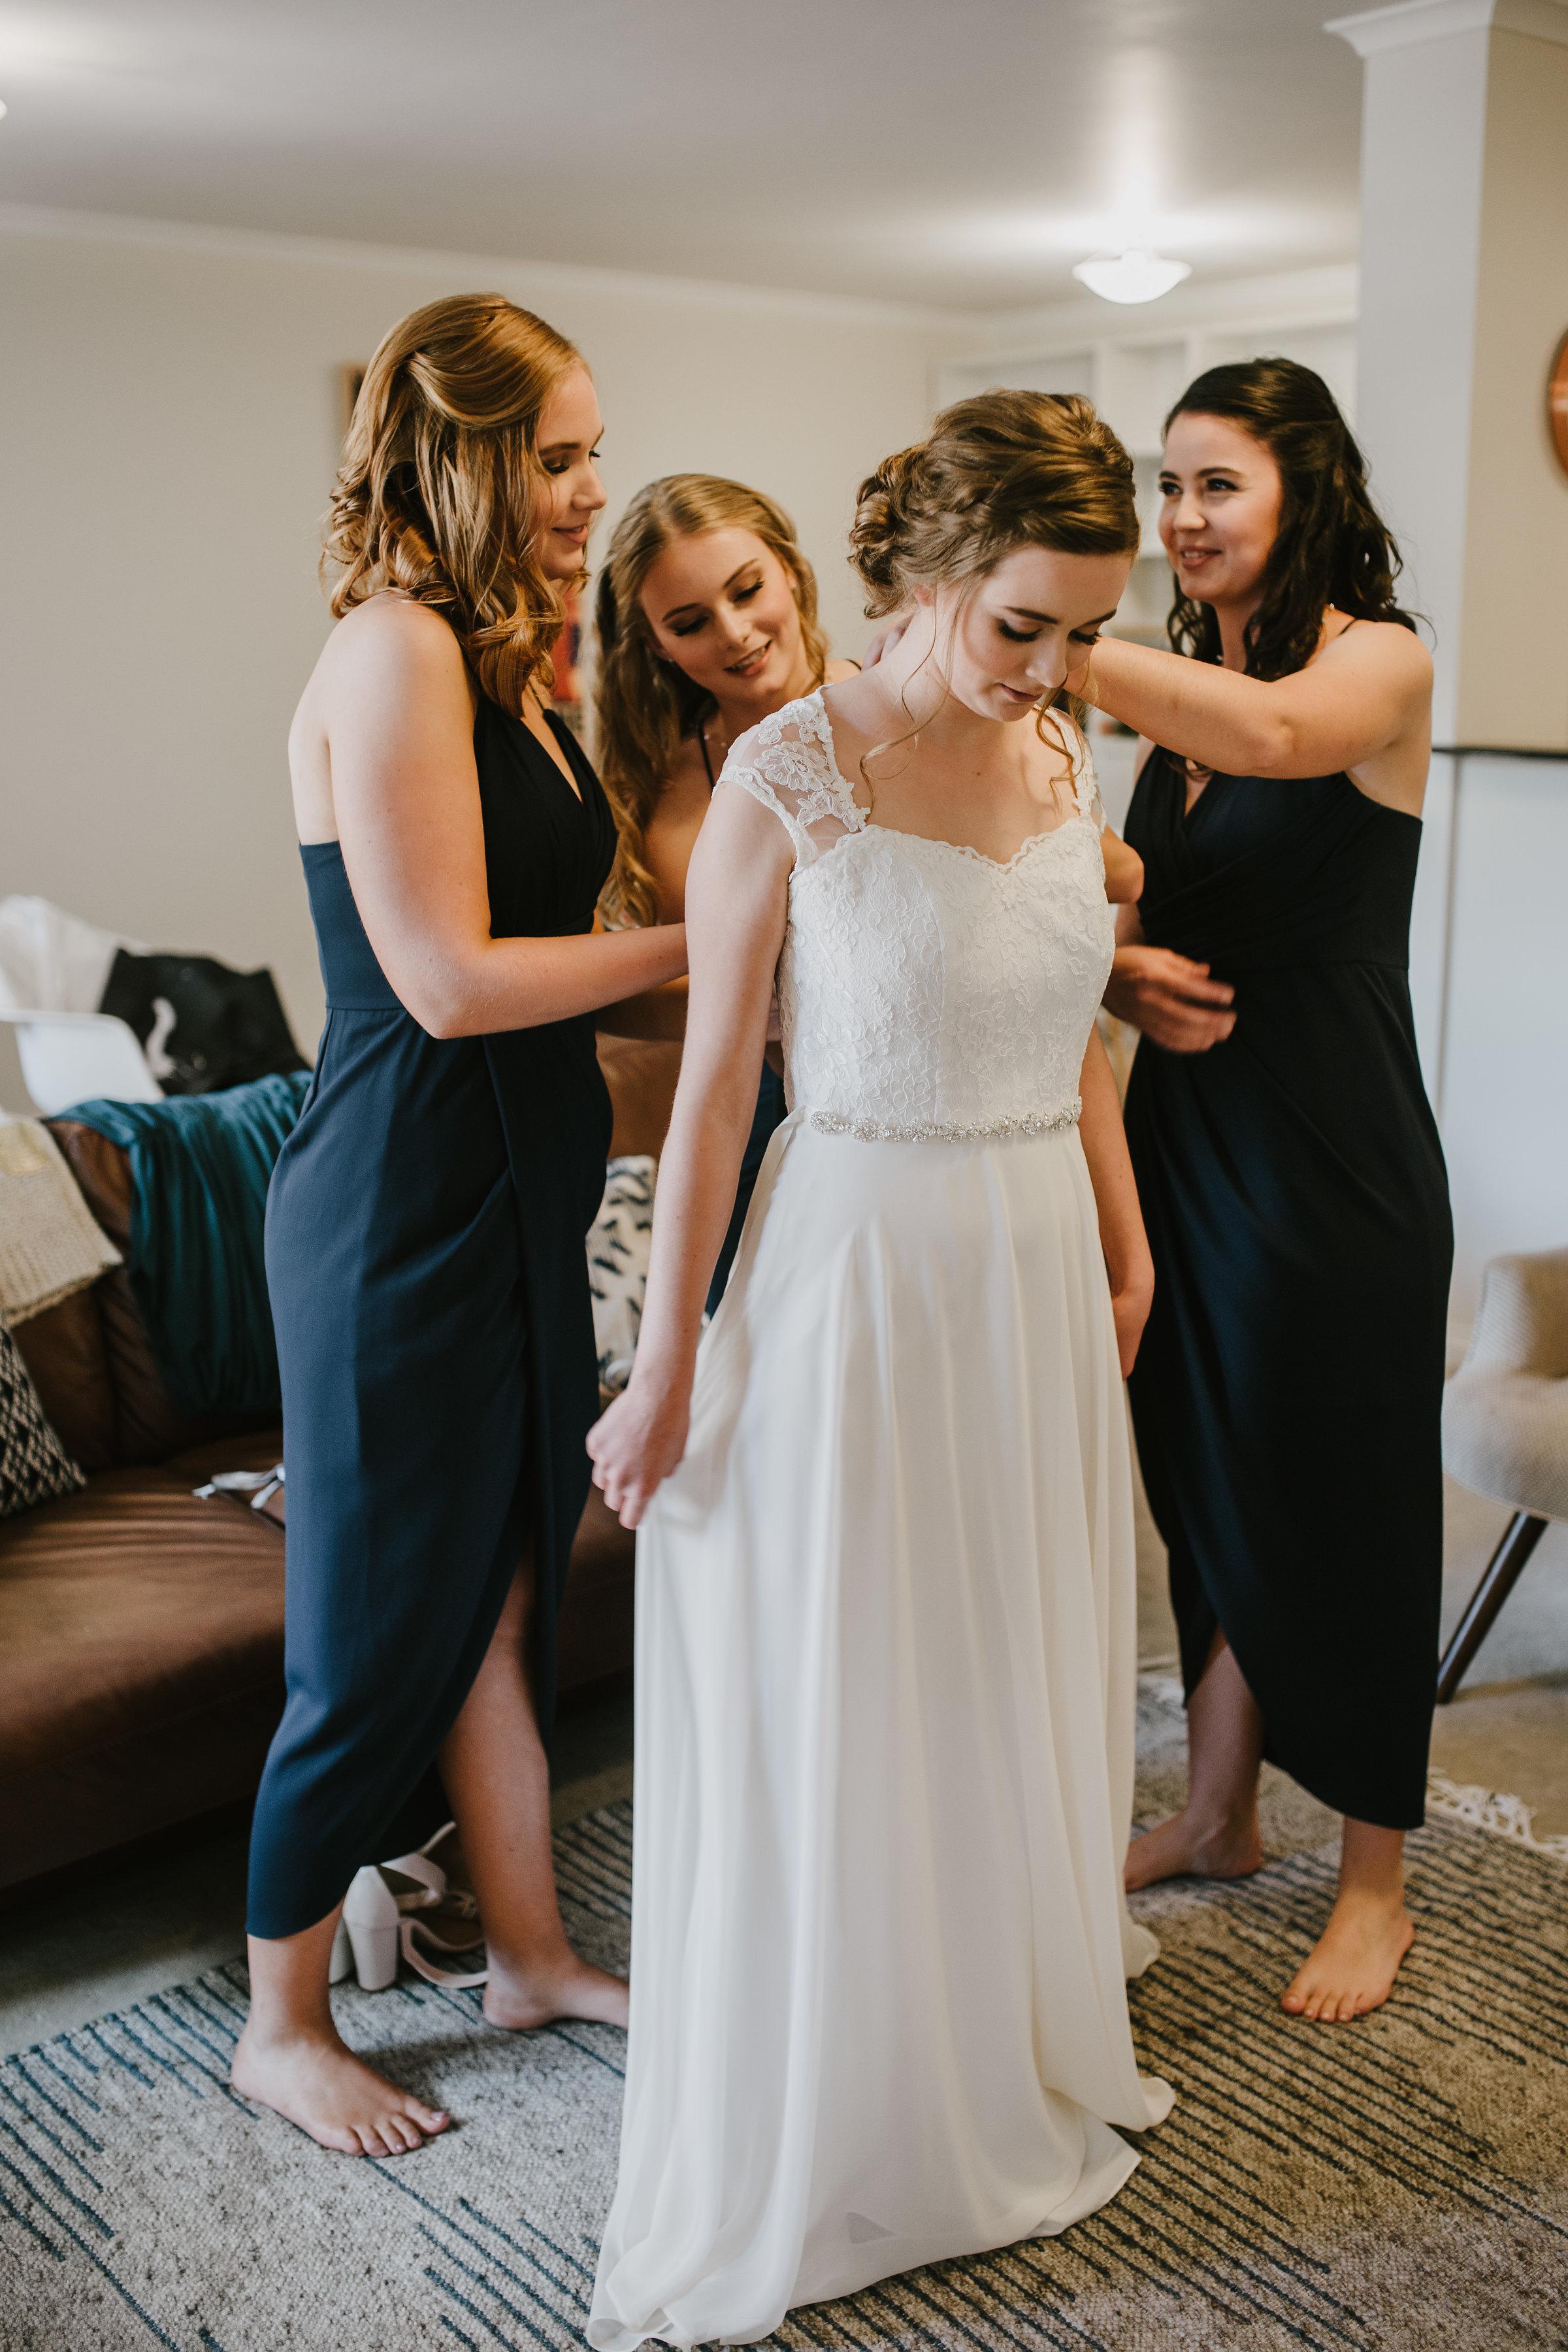 Canberra-ACT-Wedding-Eliesha-Claire-Makeup-Artistry-N&B.jpg